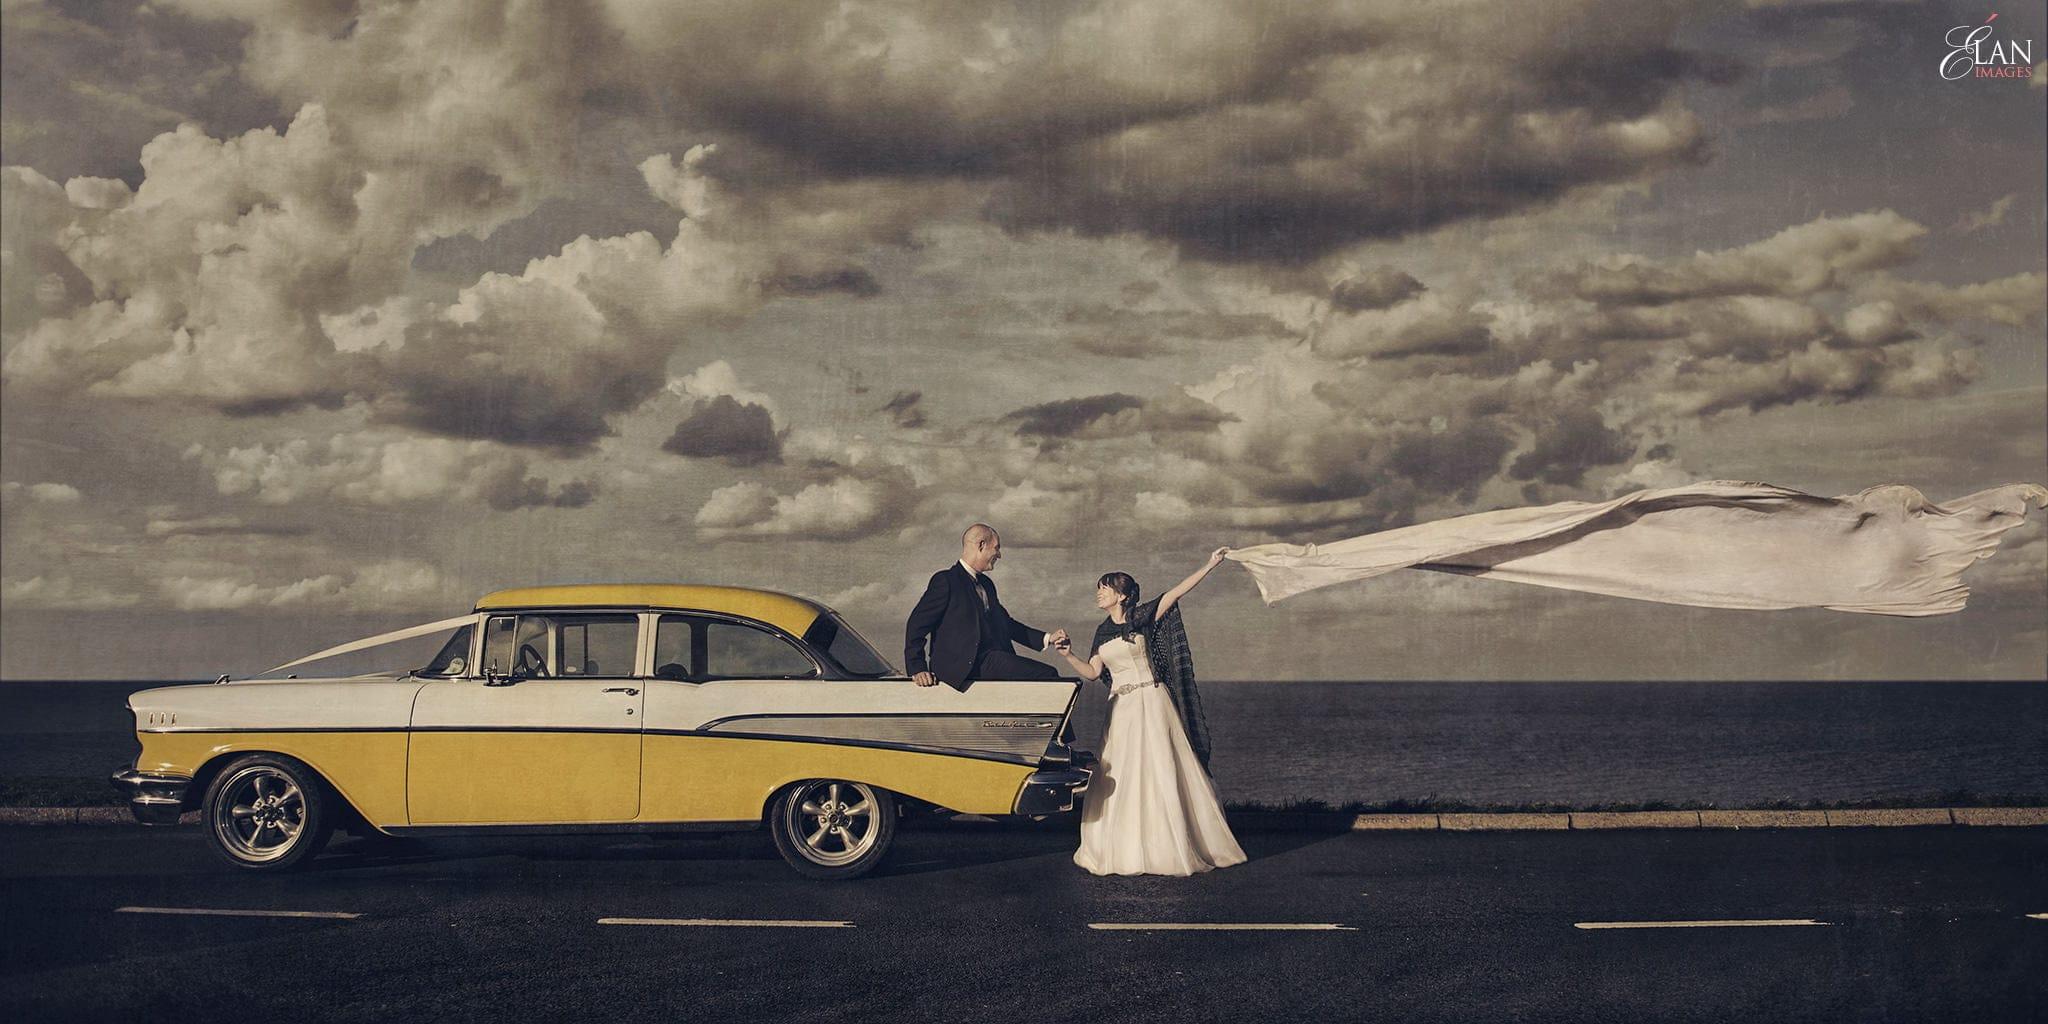 Llanerchaeron wedding photographer